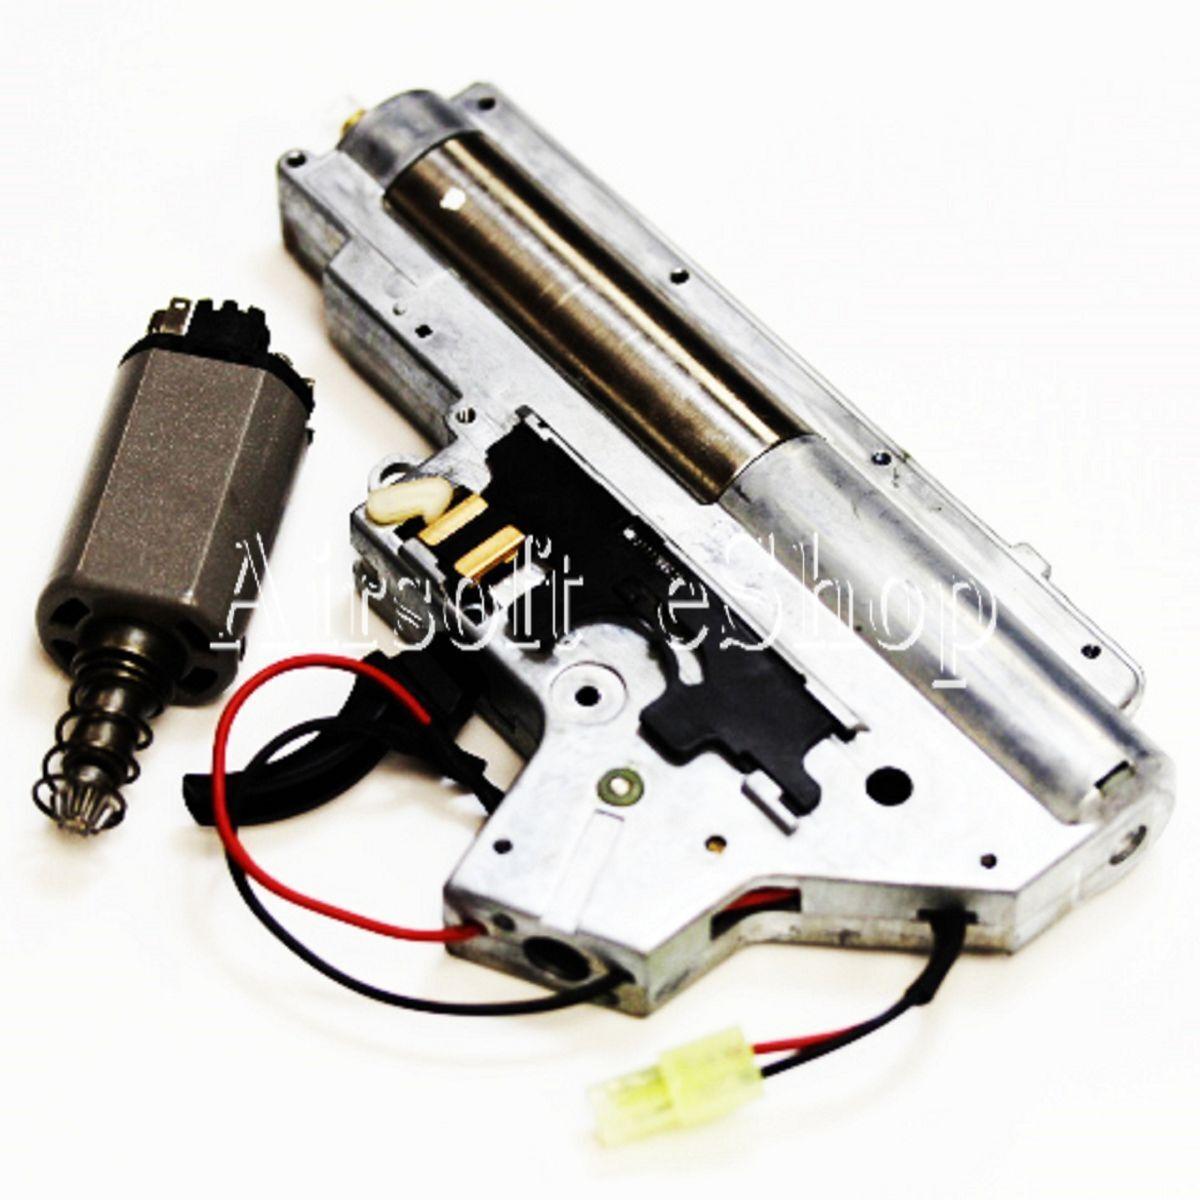 Airsoftmega Cyma 6 mm  Completo MP5 AEG caja de cambios de V2 versión 2 con motor  alta calidad